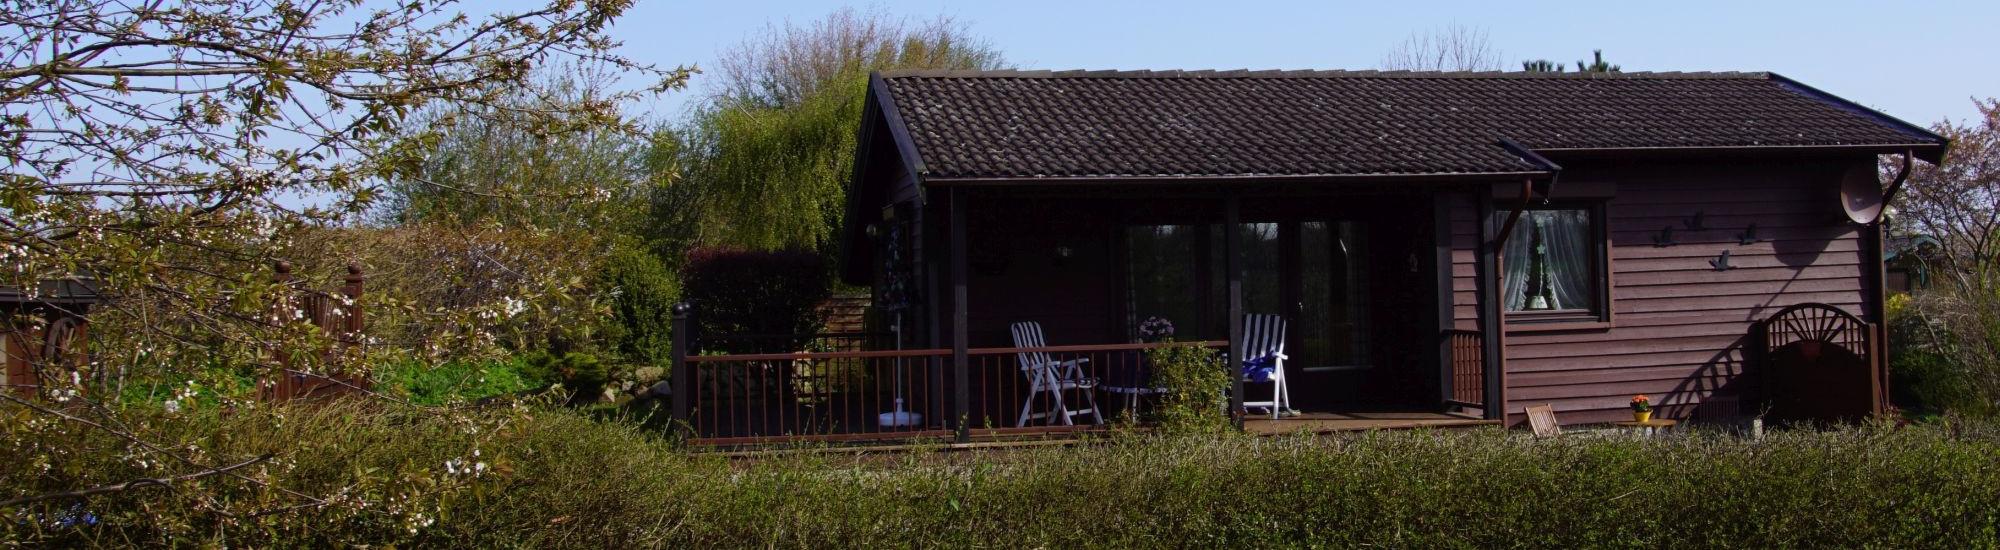 Hohenfelde - Sehr gepflegtes Holzhaus in Strandnähe, Feldrandlage!